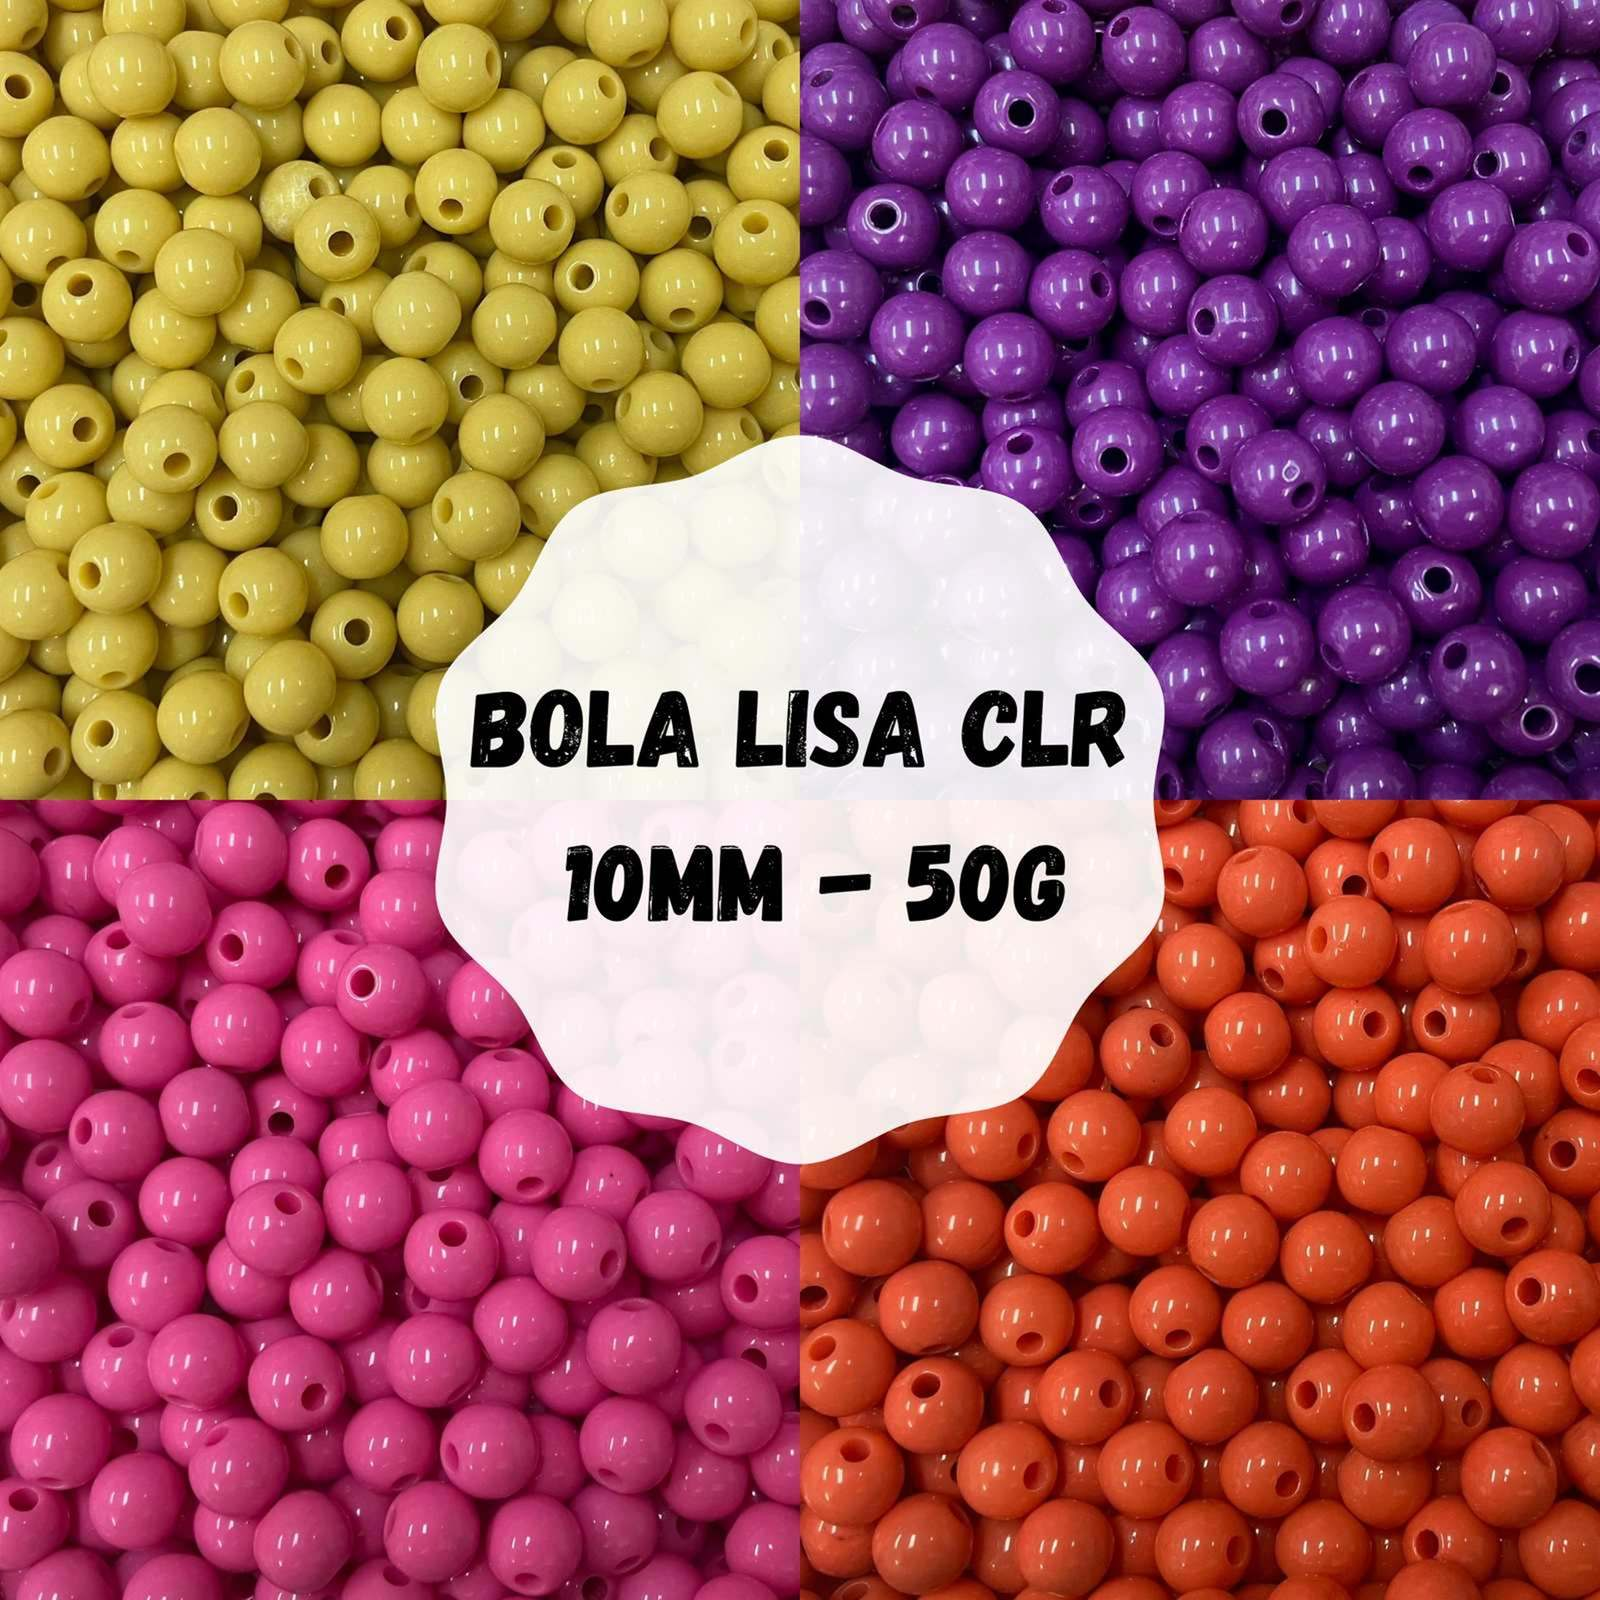 Bola Lisa CLR 10mm - 50g